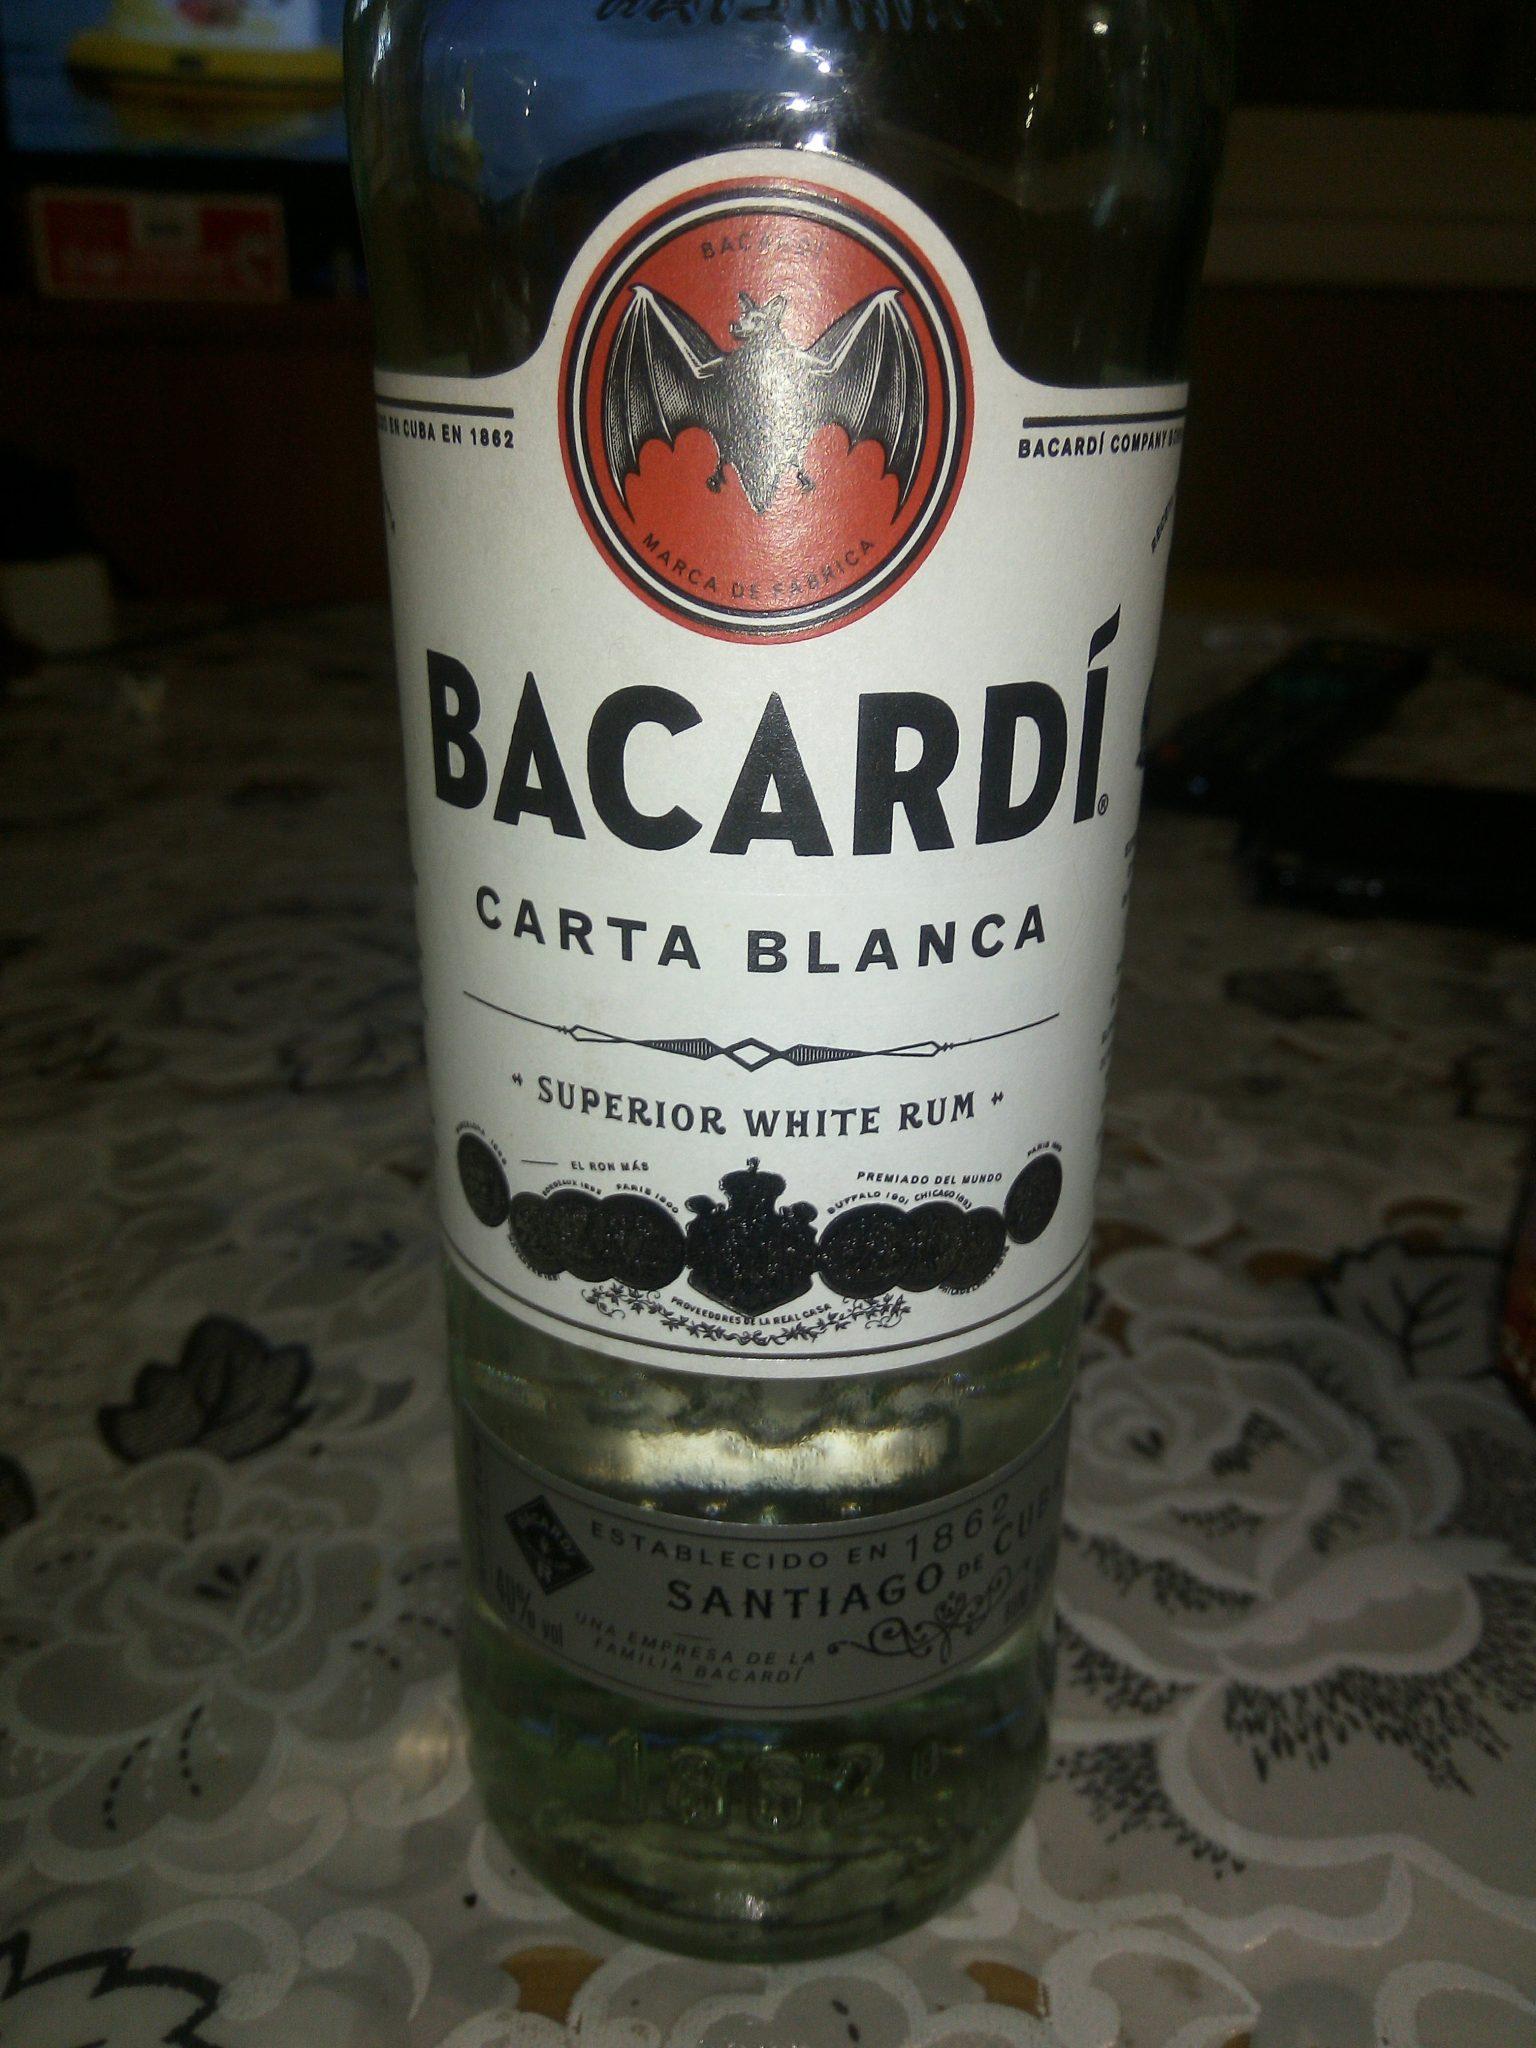 Bacardi. White rum